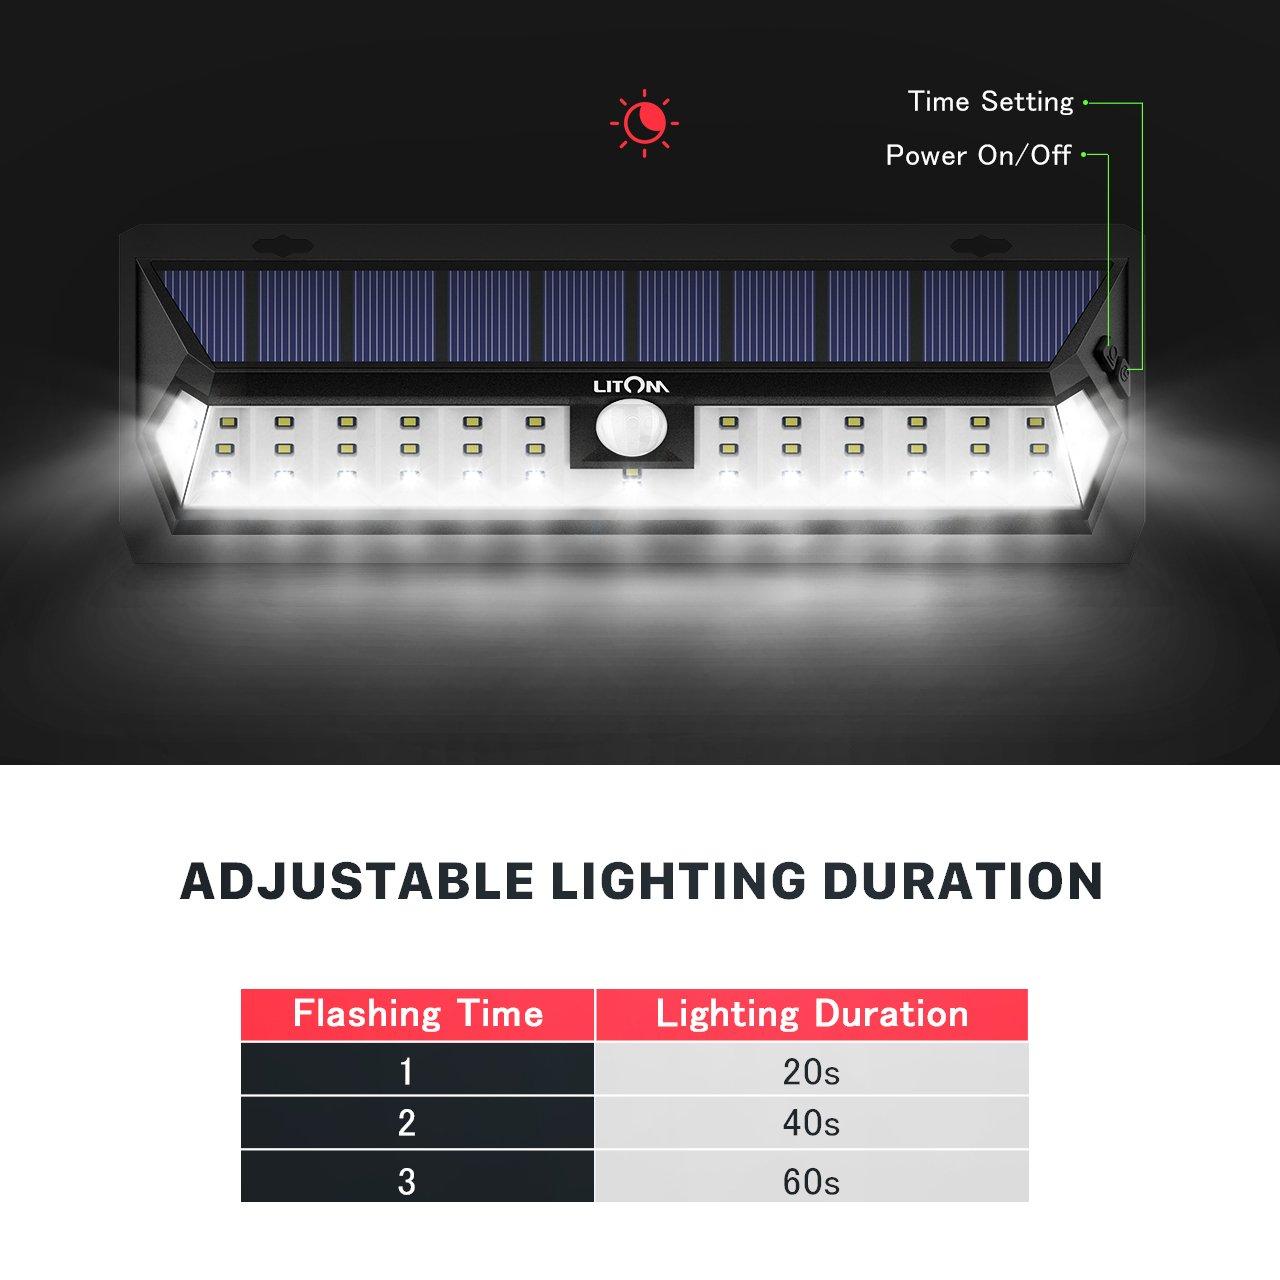 LITOM Solar Lights Outdoor 42 LED, Adjustable Lighting Time Solar Motion Sensor Light with 270° Wide Angle and Waterproof Design, Wireless Solar Lighting for Front Door, Yard, Garage, Deck (2 Pack) by Litom (Image #6)